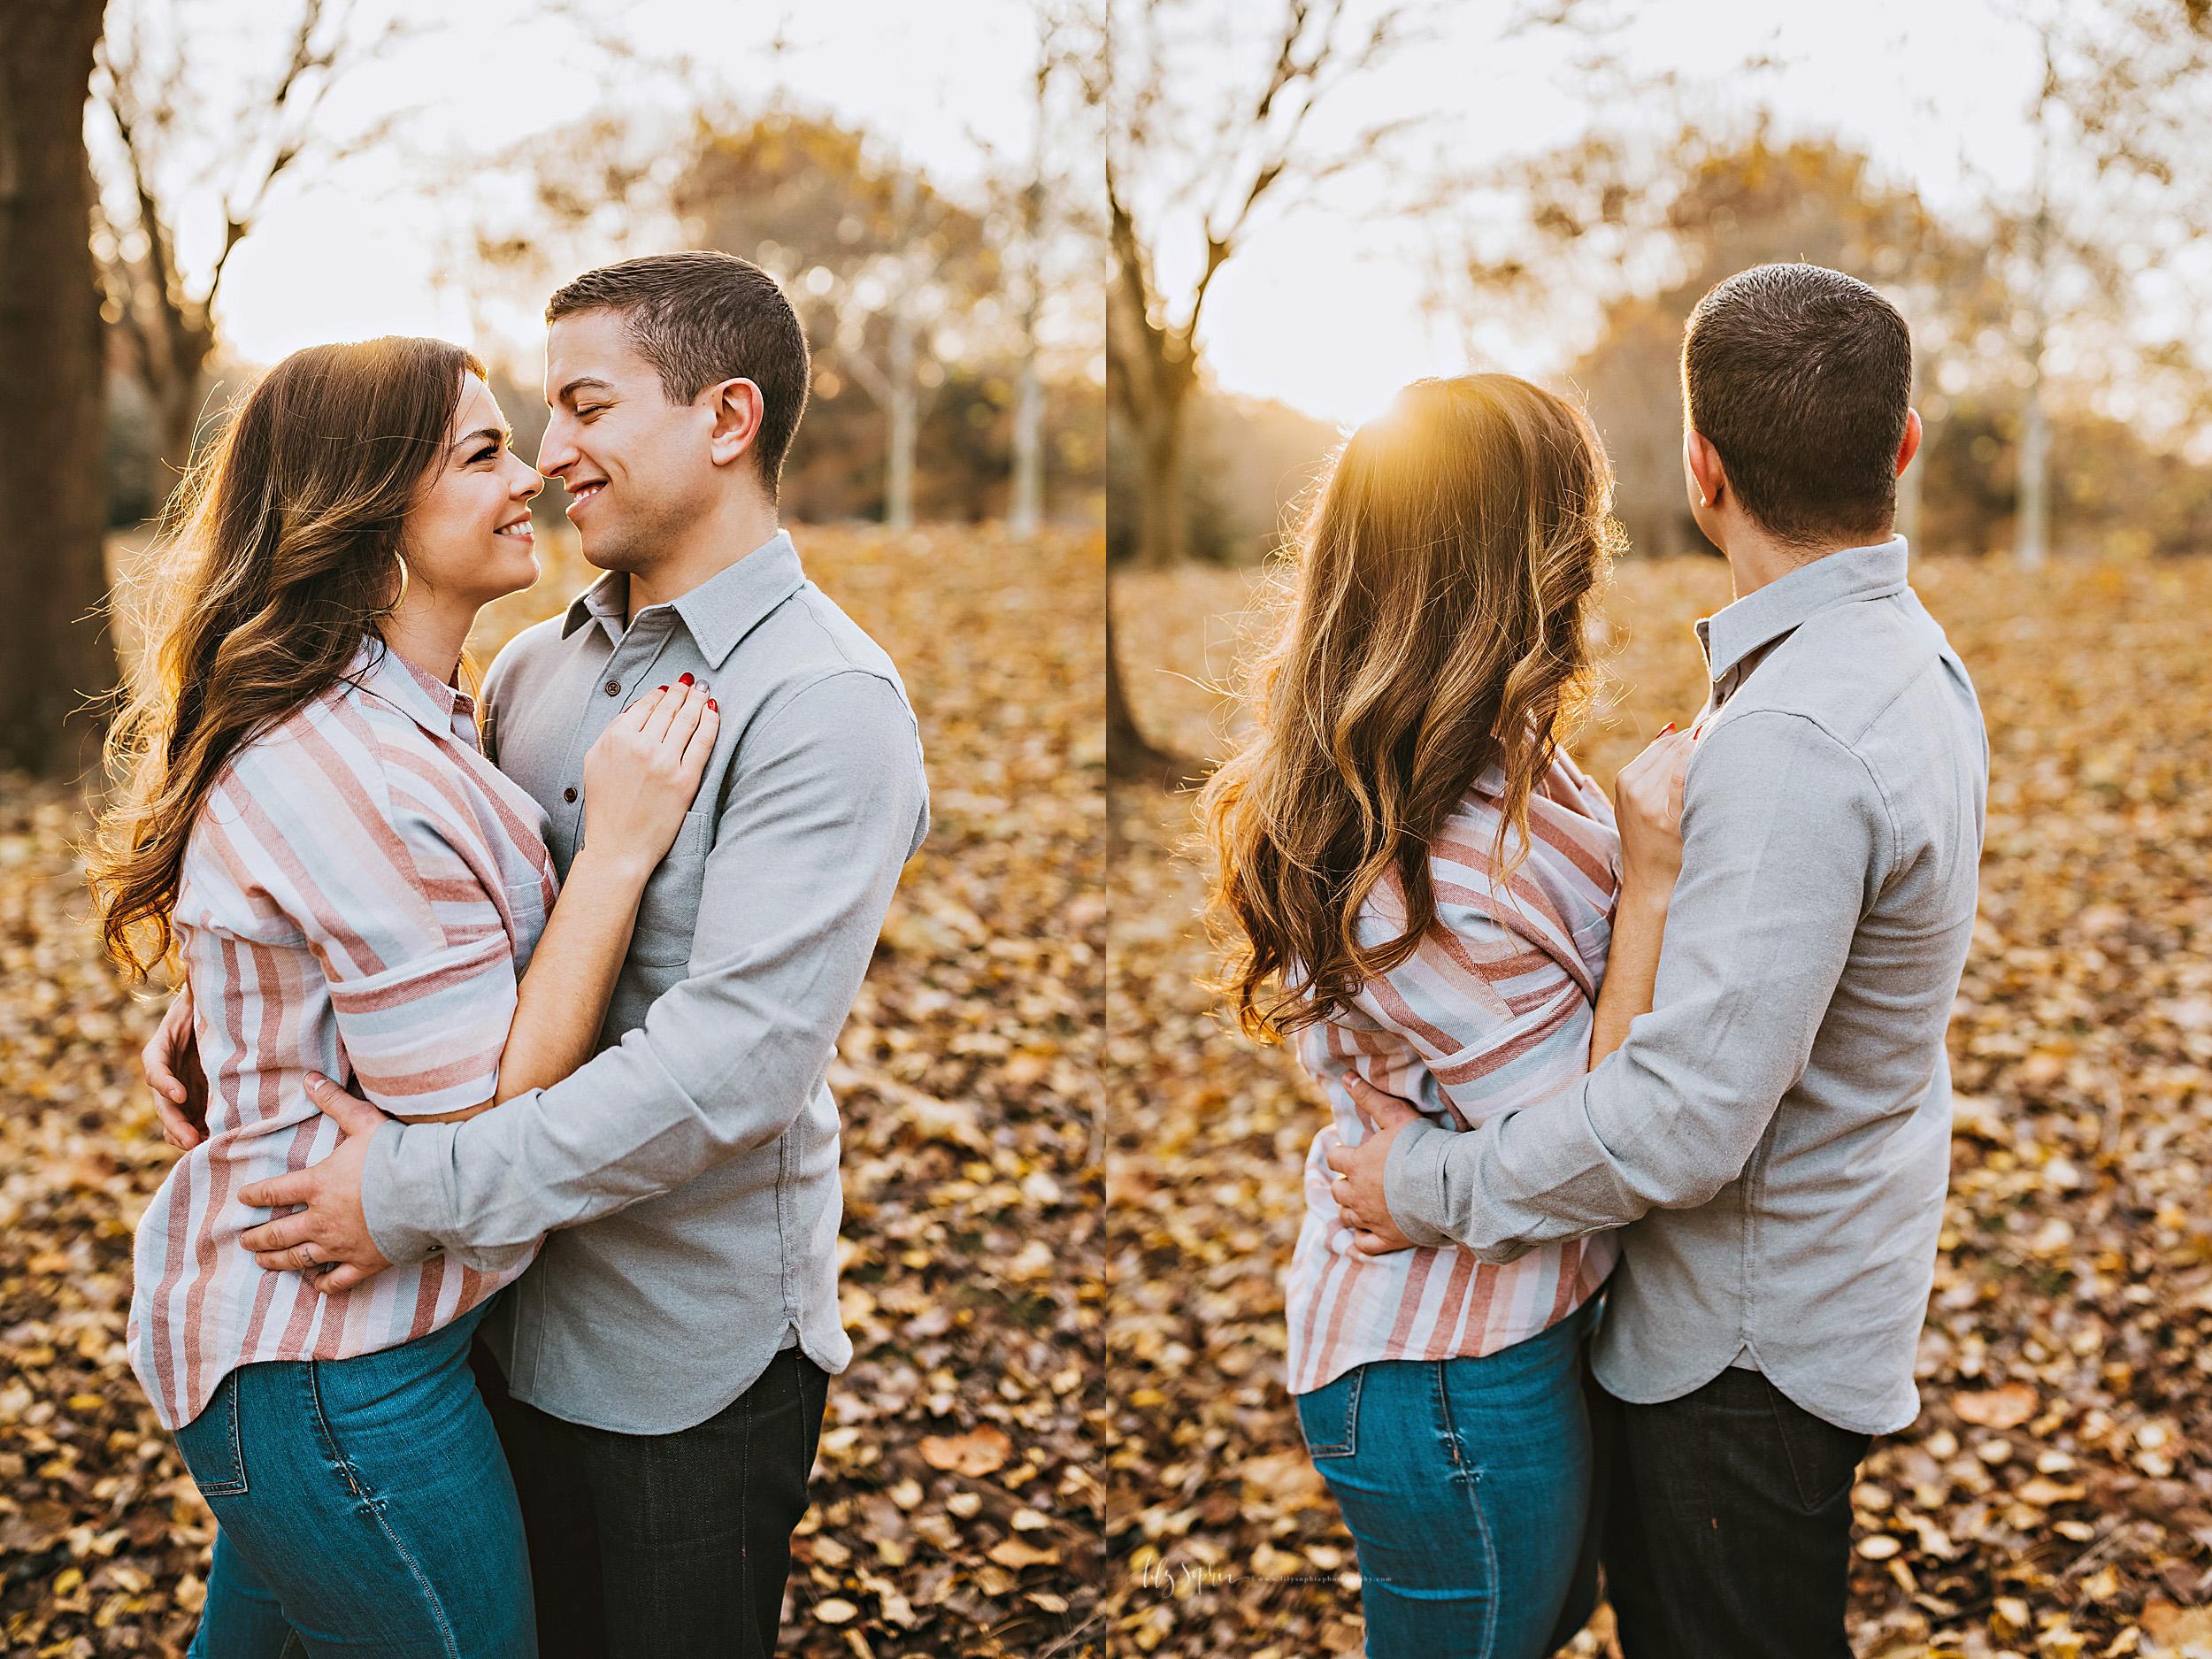 atlanta-reynoldstown-peoplestown-decatur-sandy-springs-buckhead-virginia-highlands-west-end-decatur-lily-sophia-photography-outdoor-fall-couples-photos_1489.jpg